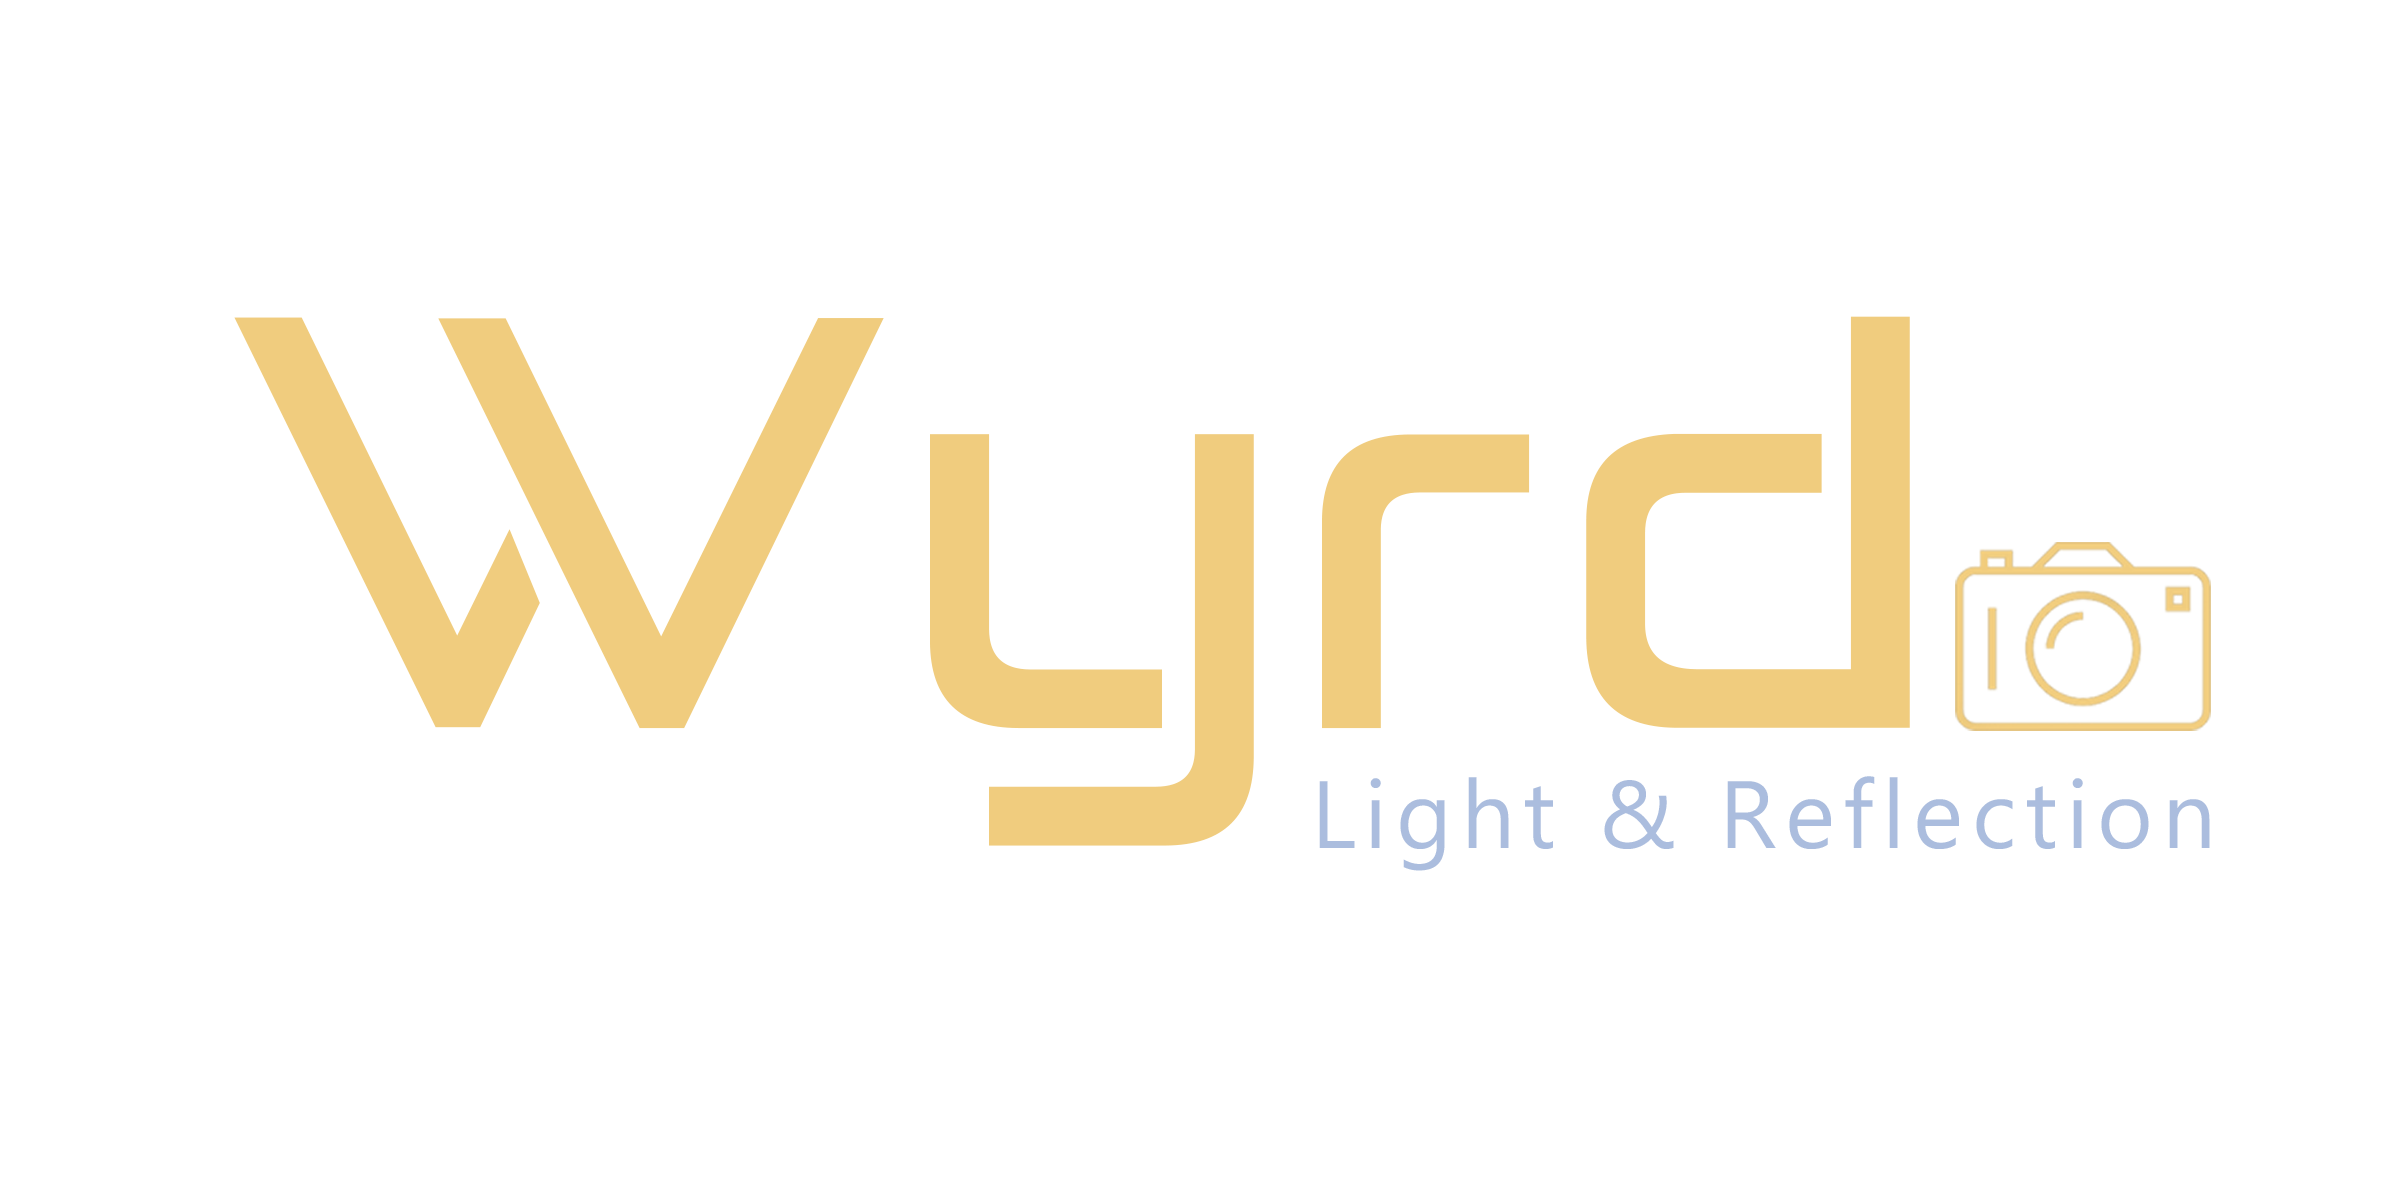 Wyrd Light & Reflection